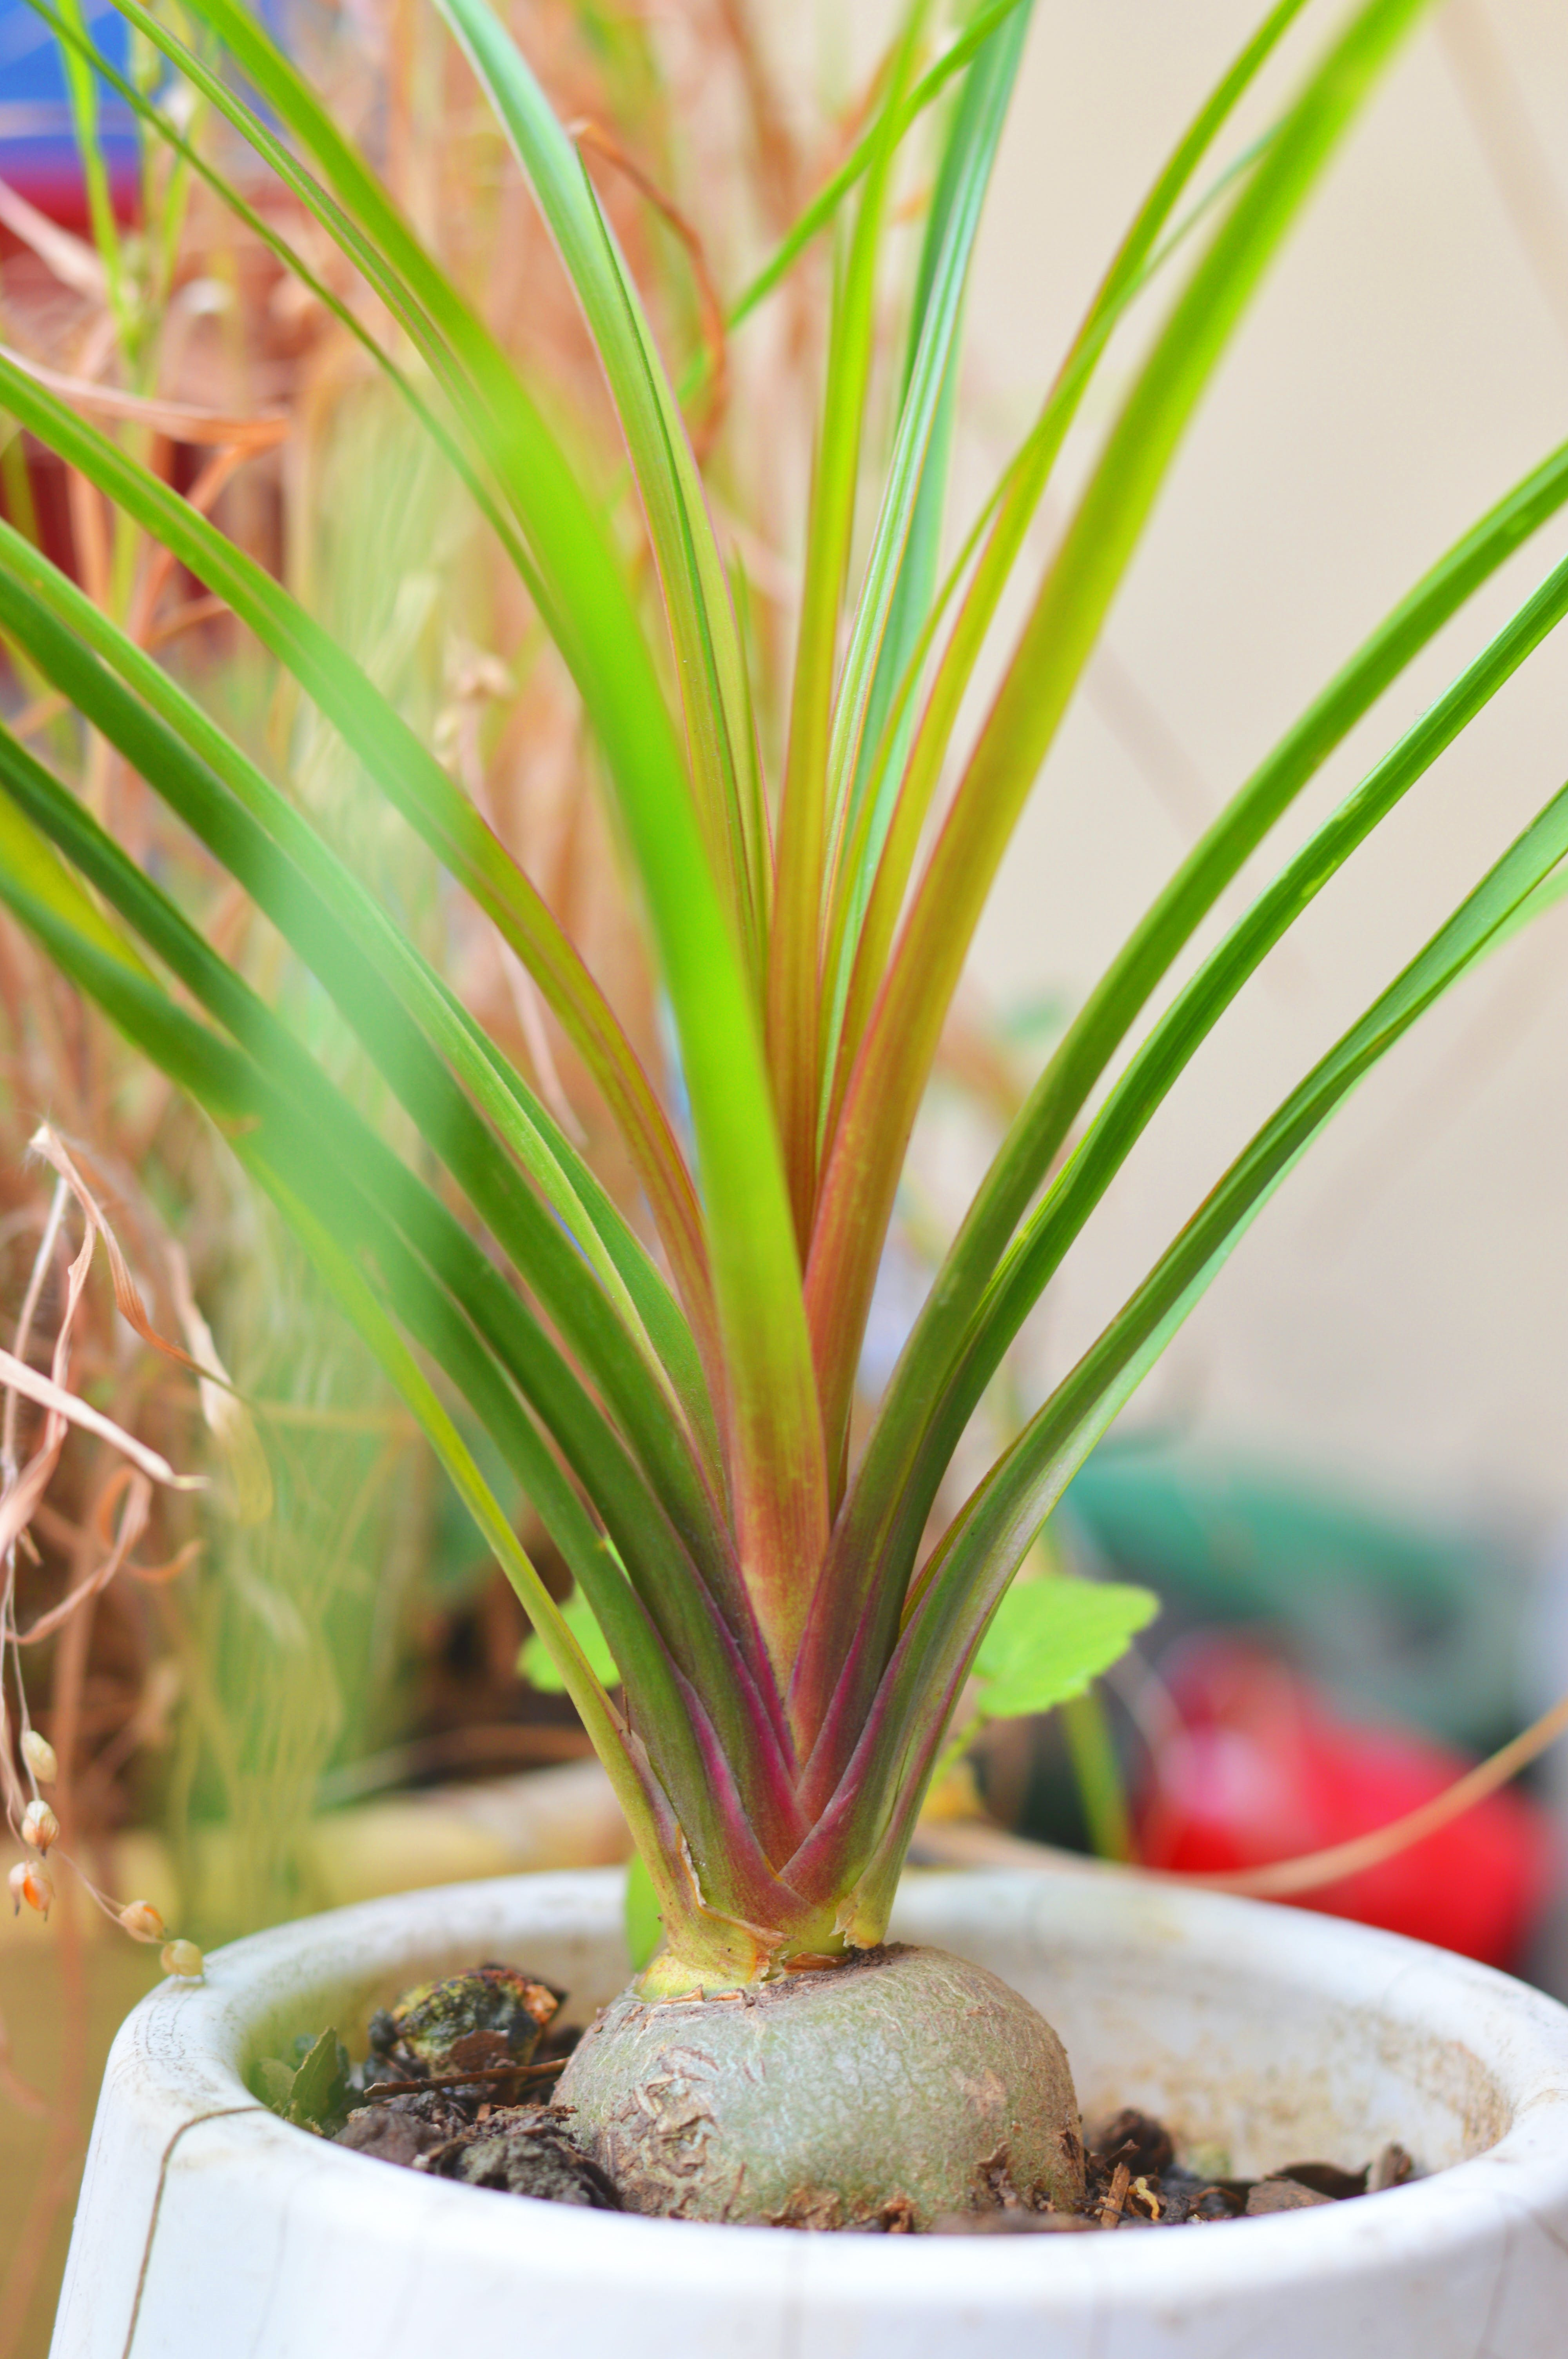 Free stock photo of nature, garden, plant, pot